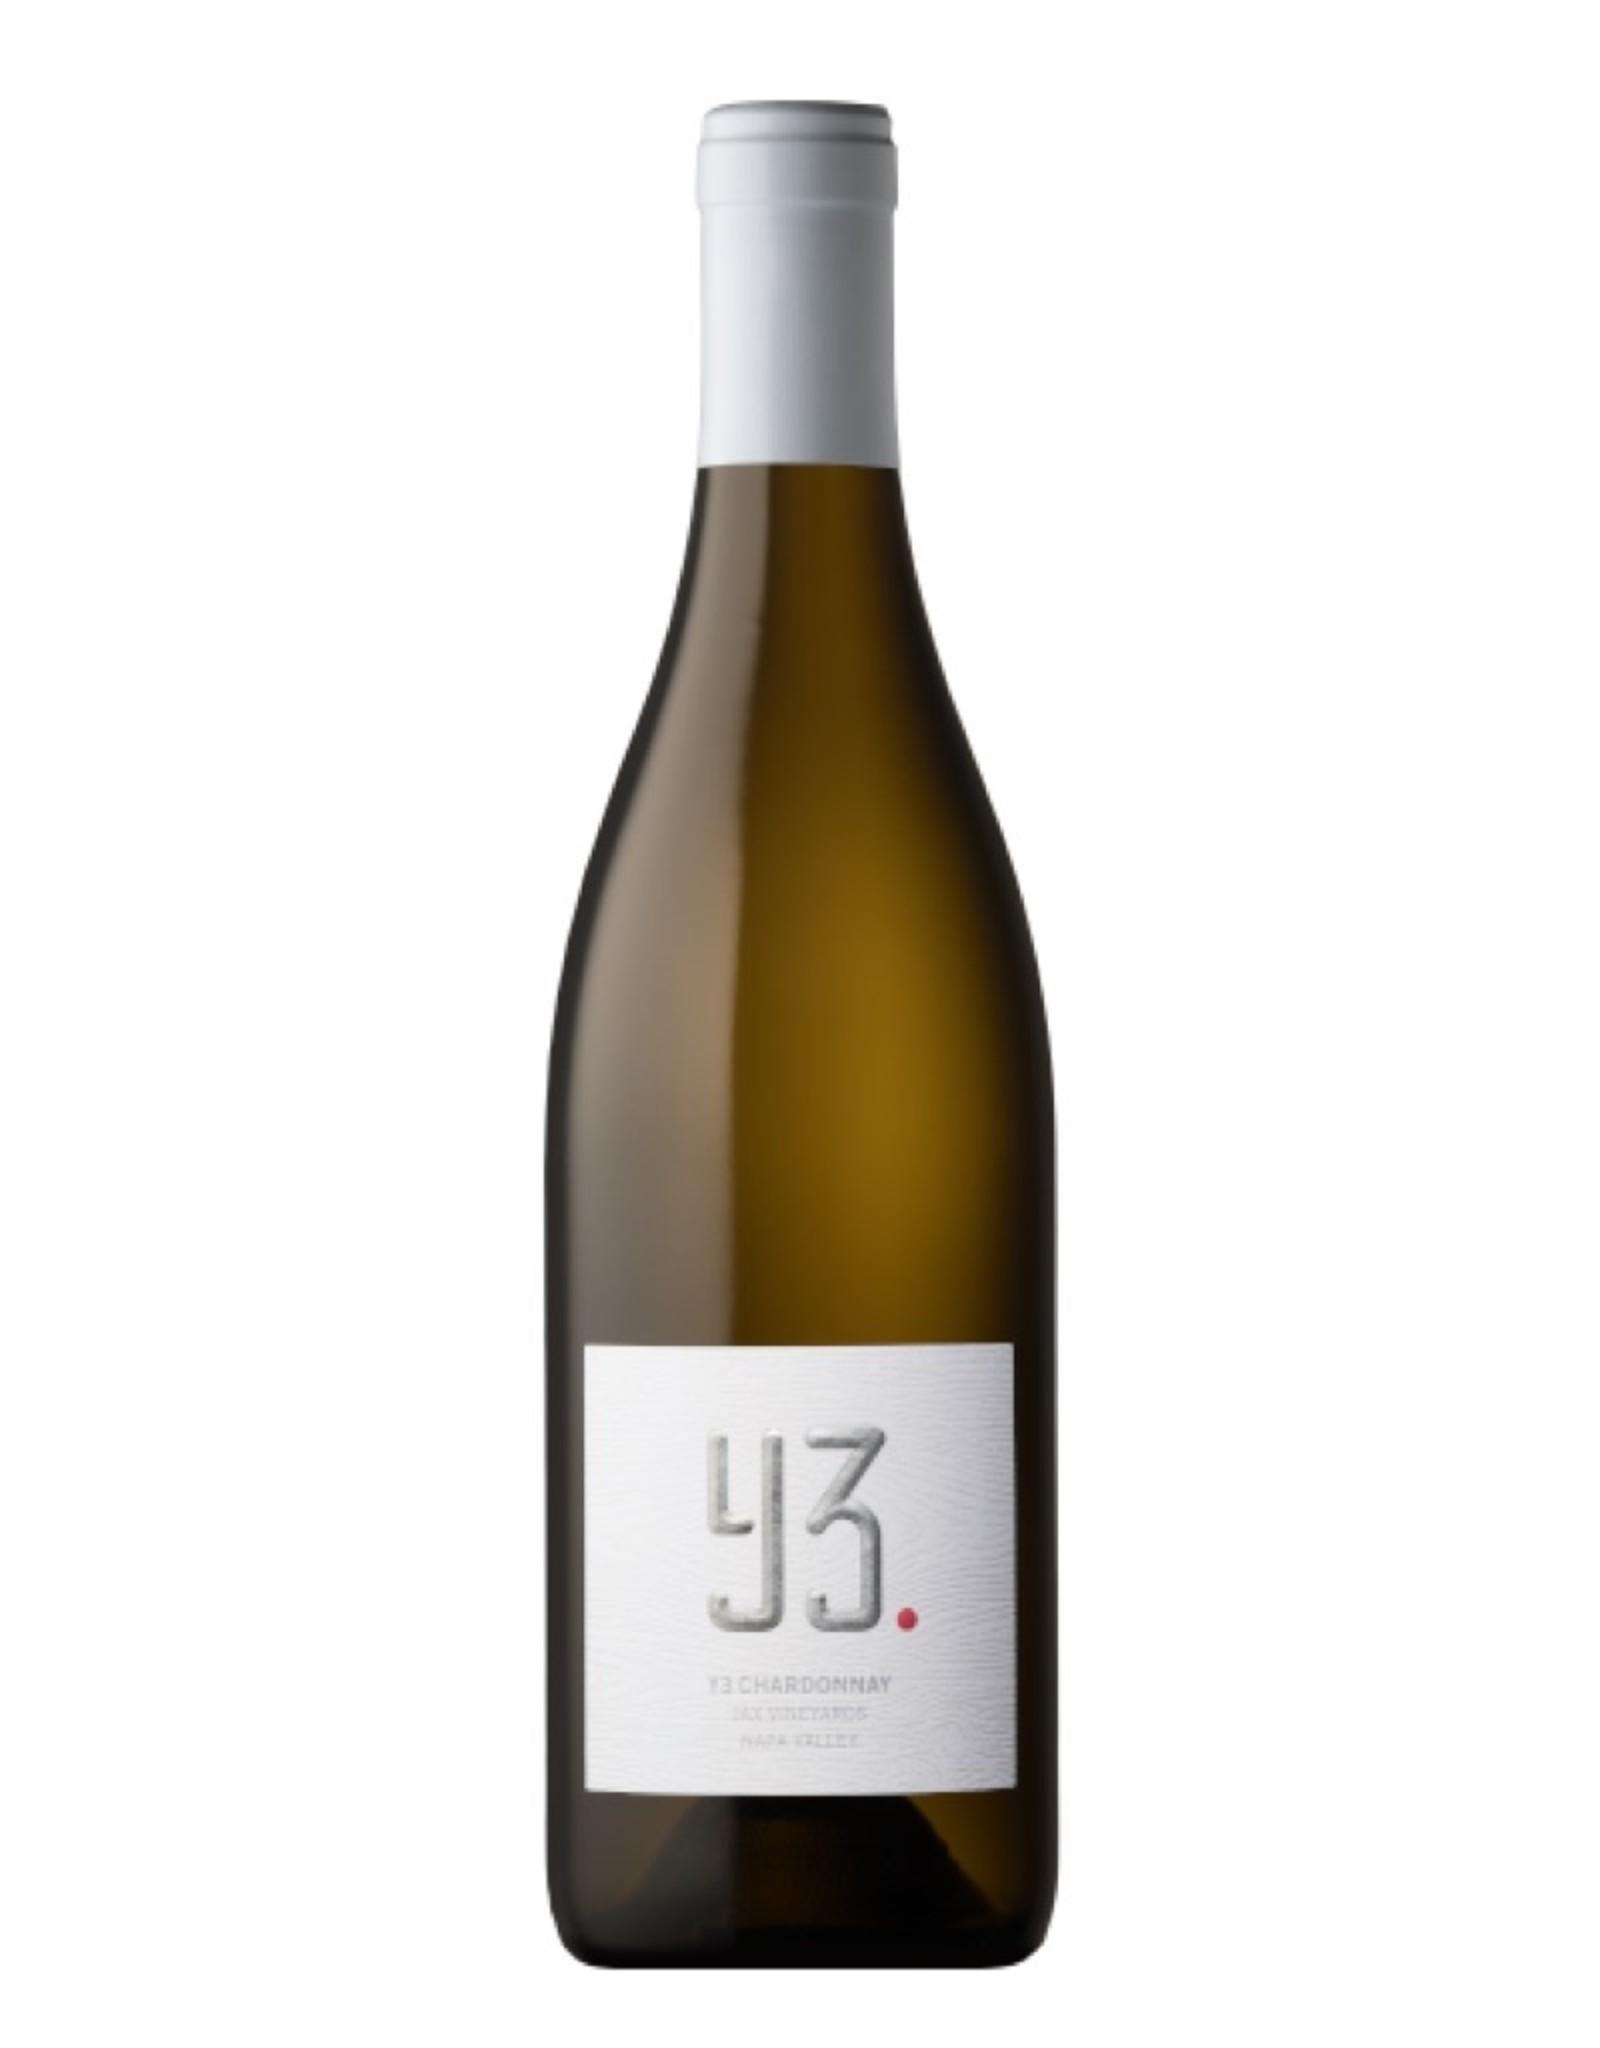 JAX Y3 Napa Chardonnay 2019